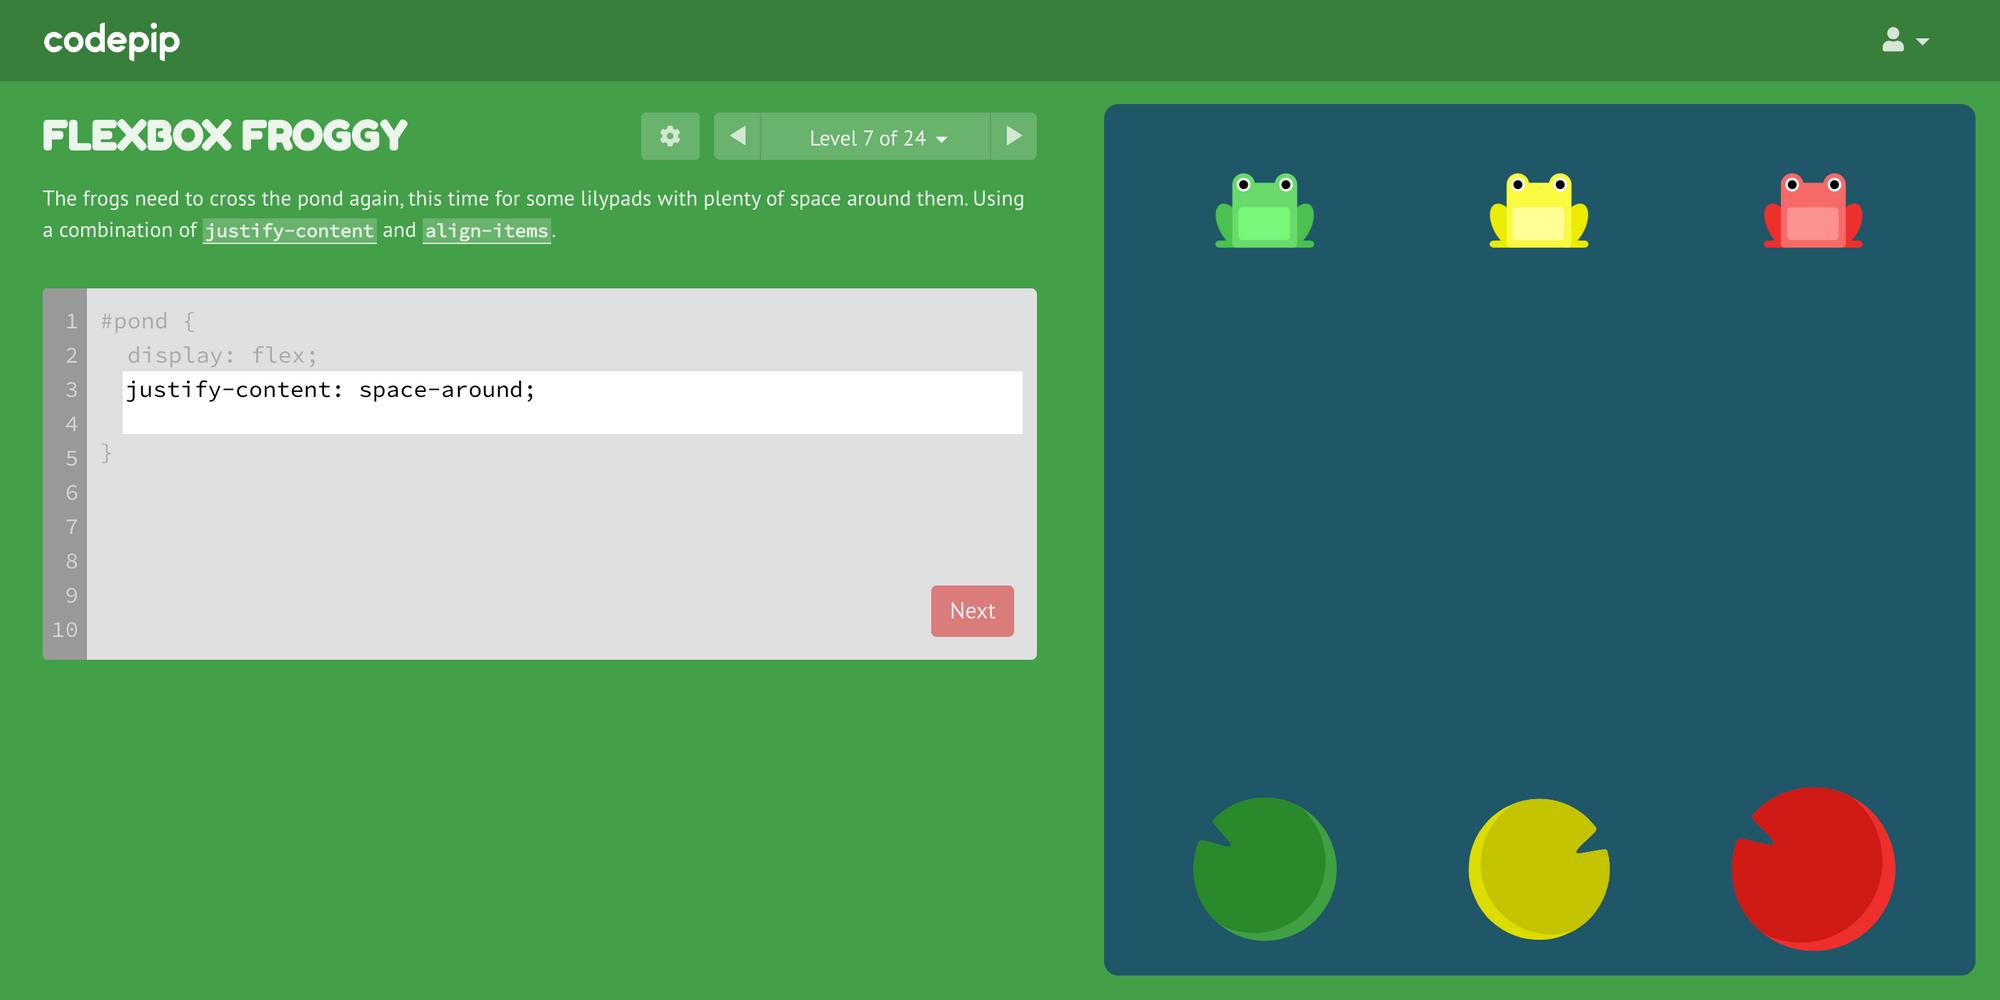 codepip.com_games_flexbox-froggy_